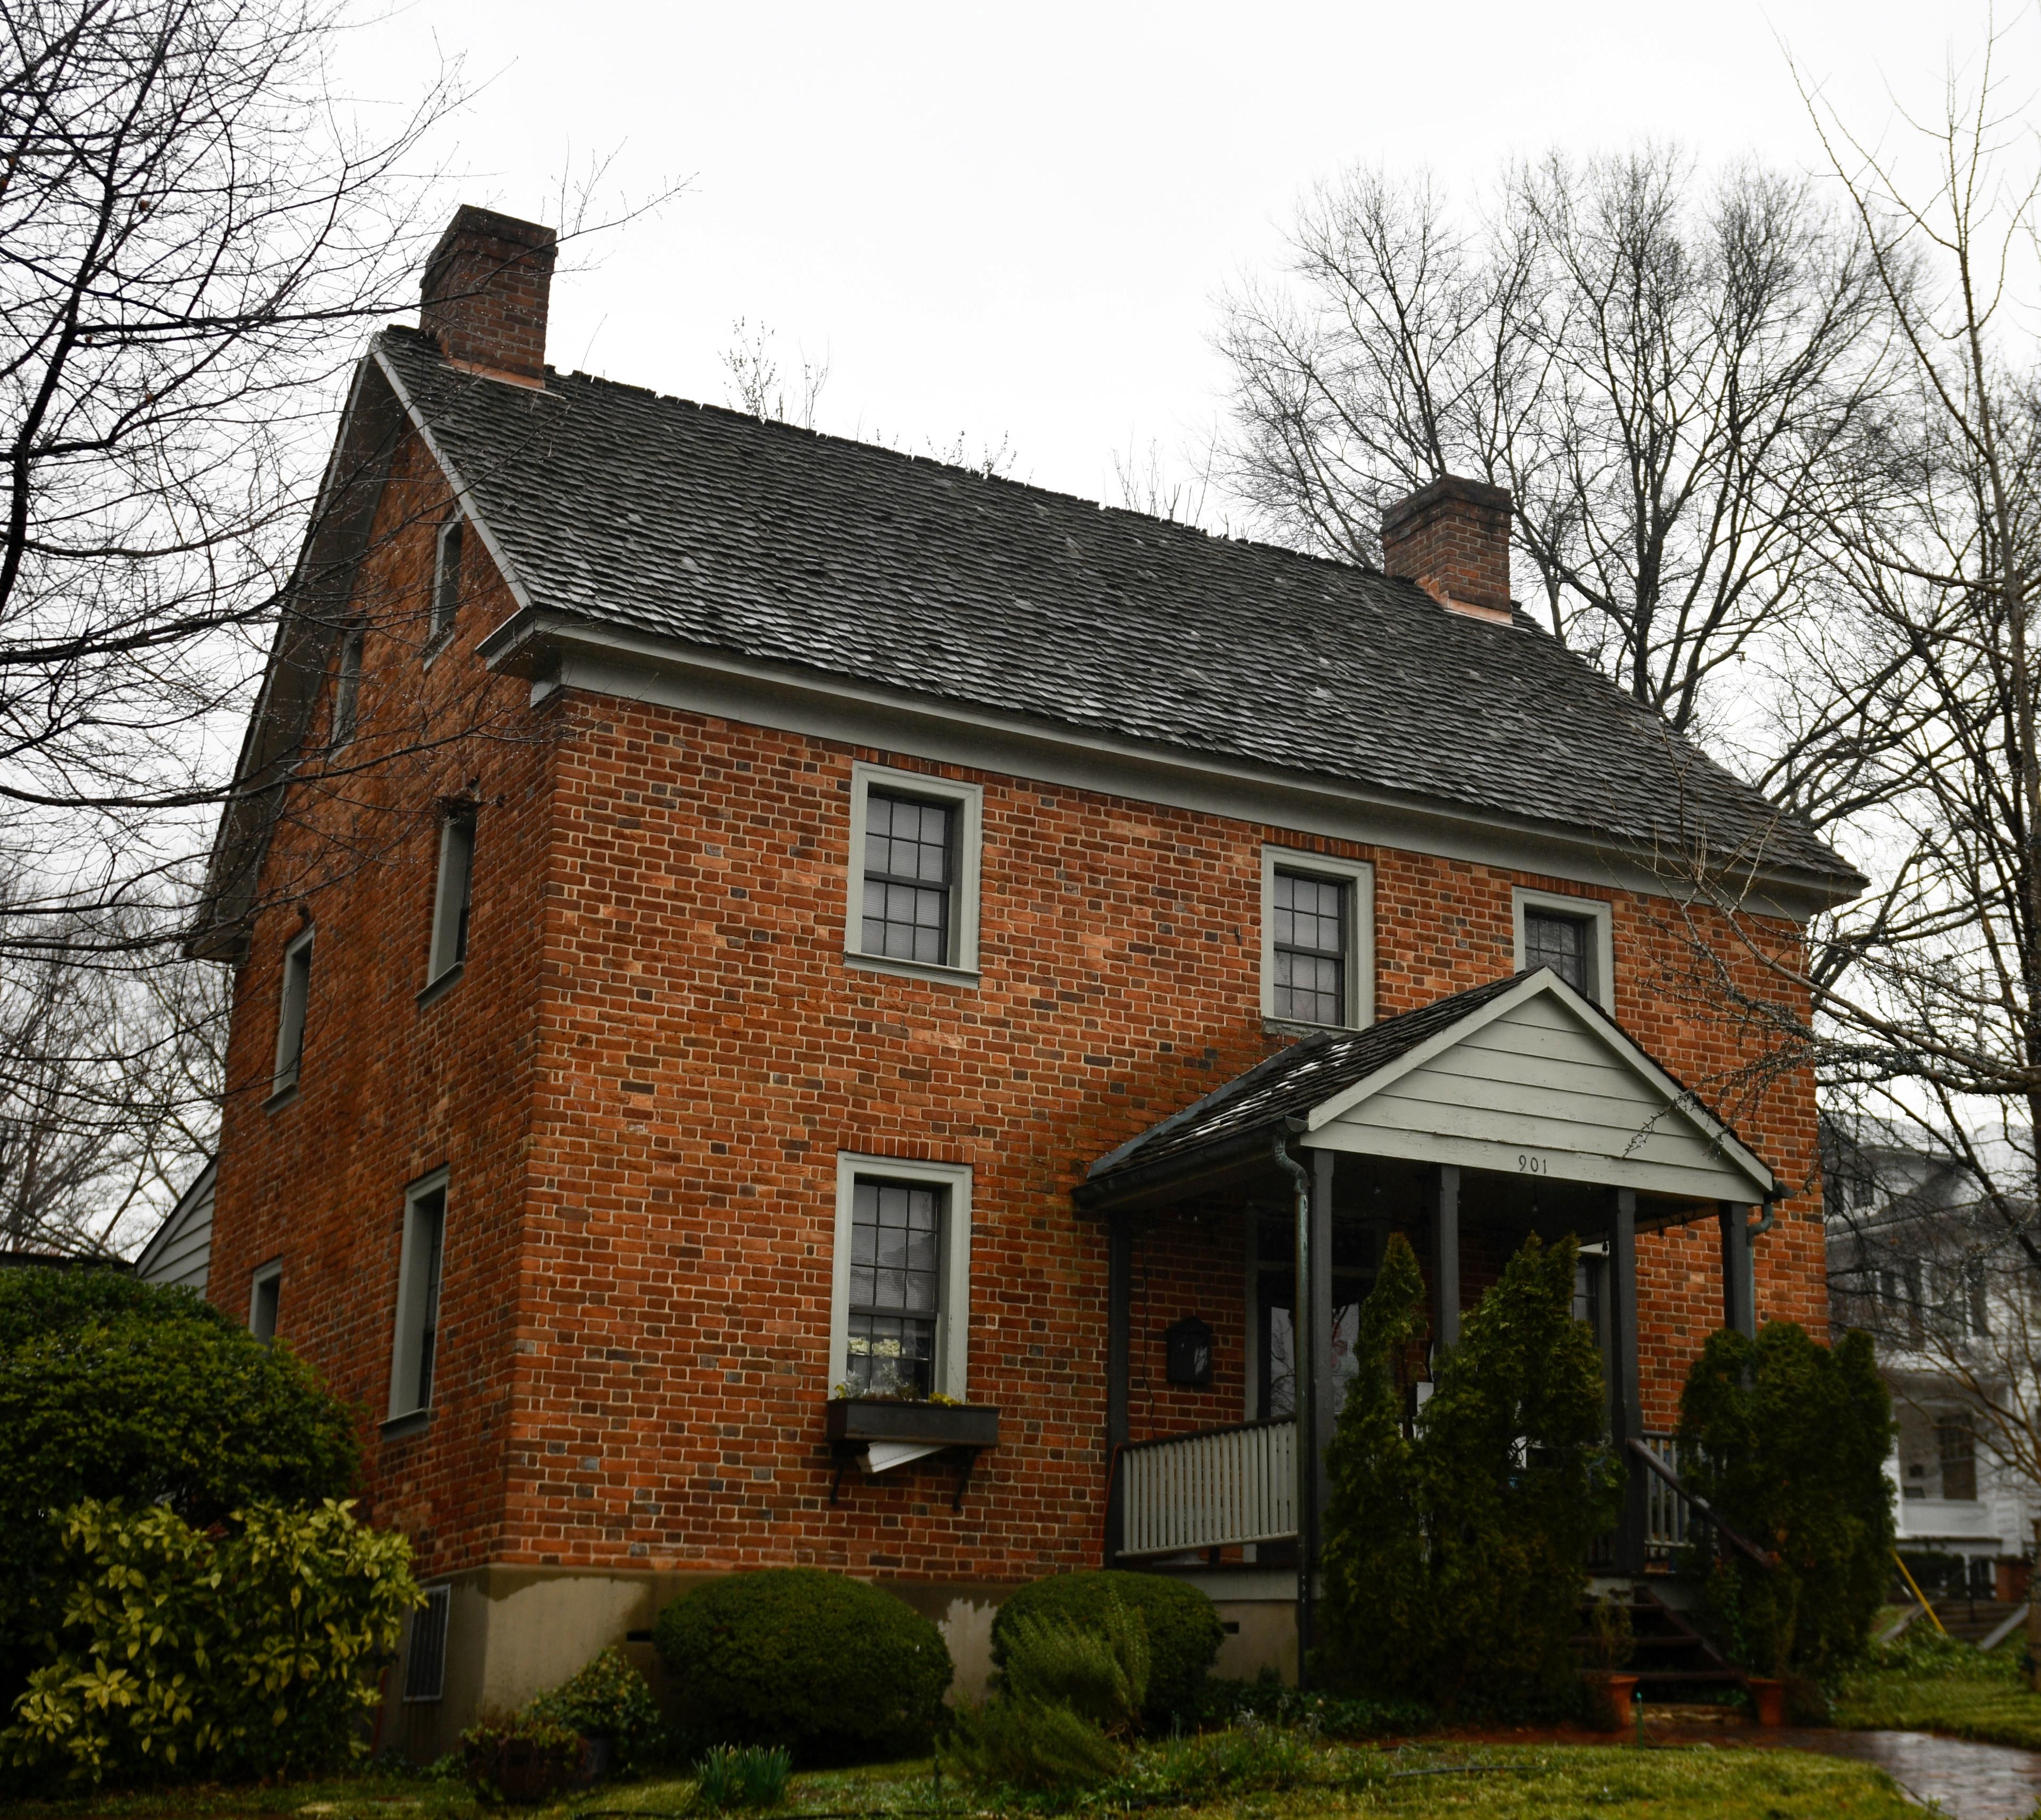 Zevely House